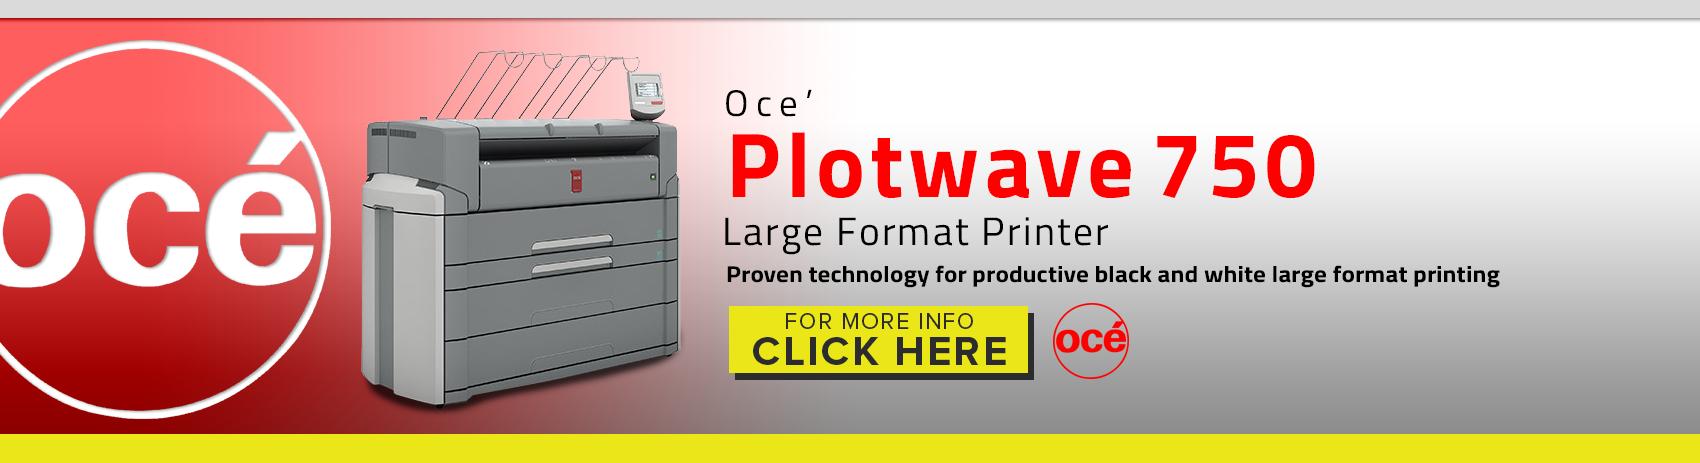 oce-plotwave-750